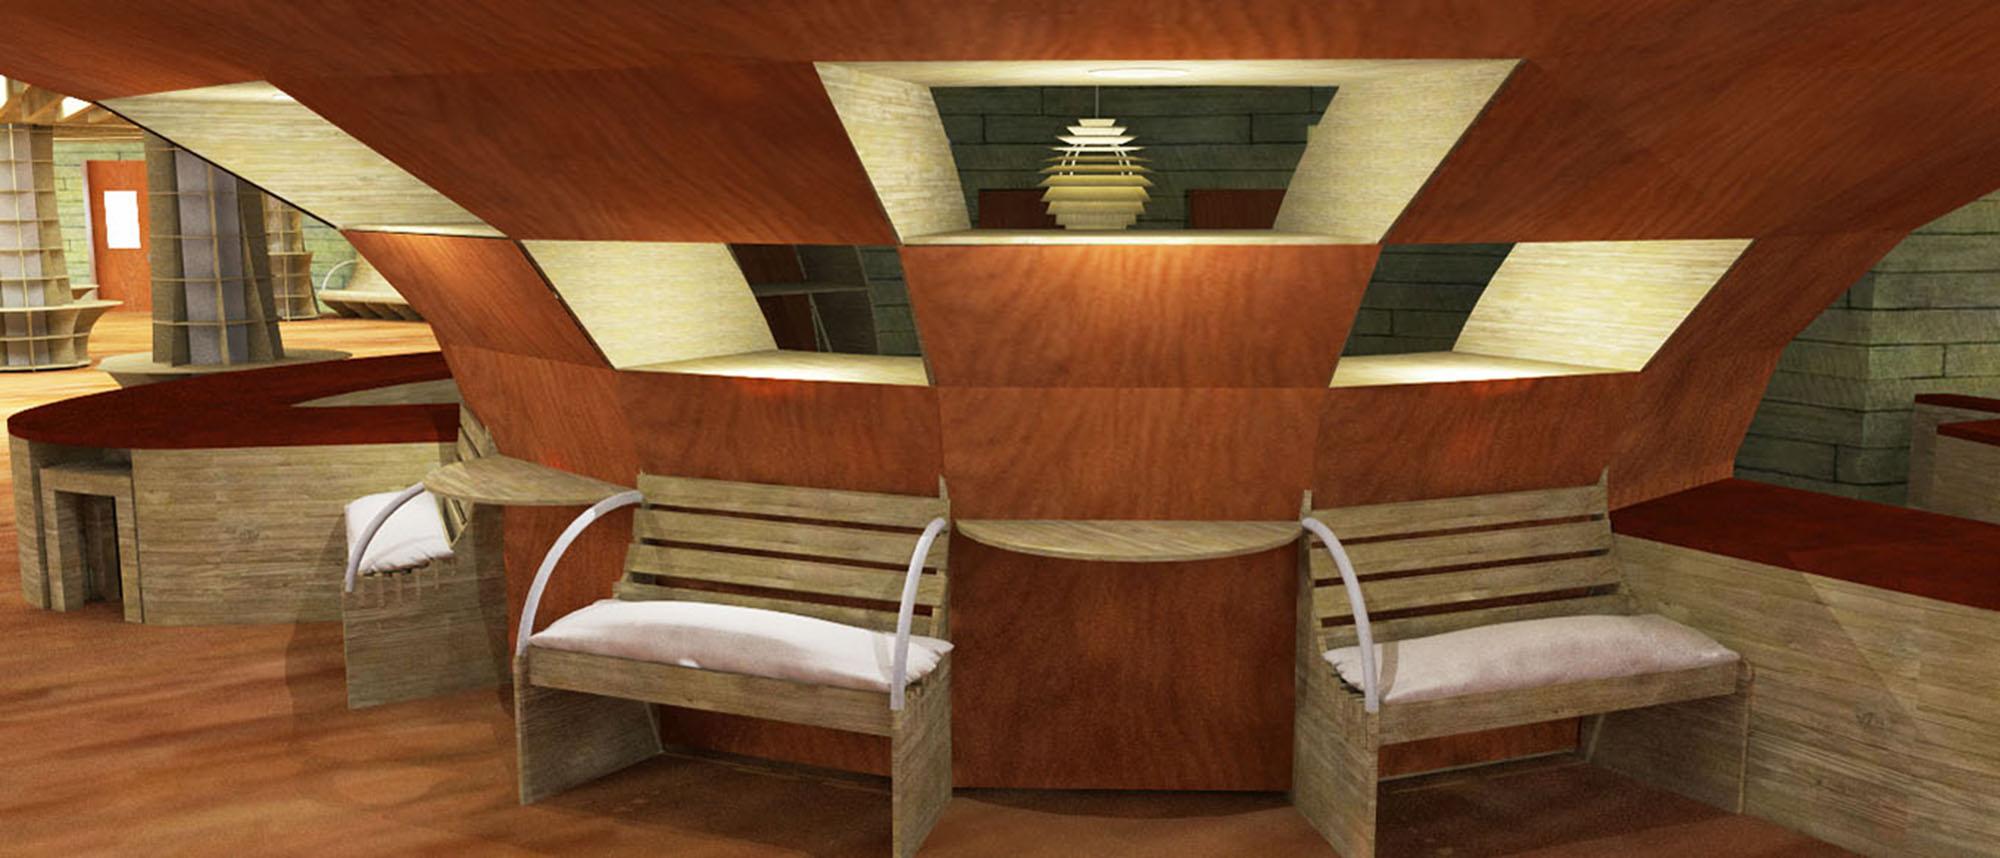 Wall-To-Ceiling_Nursing-Station-Seating.jpg